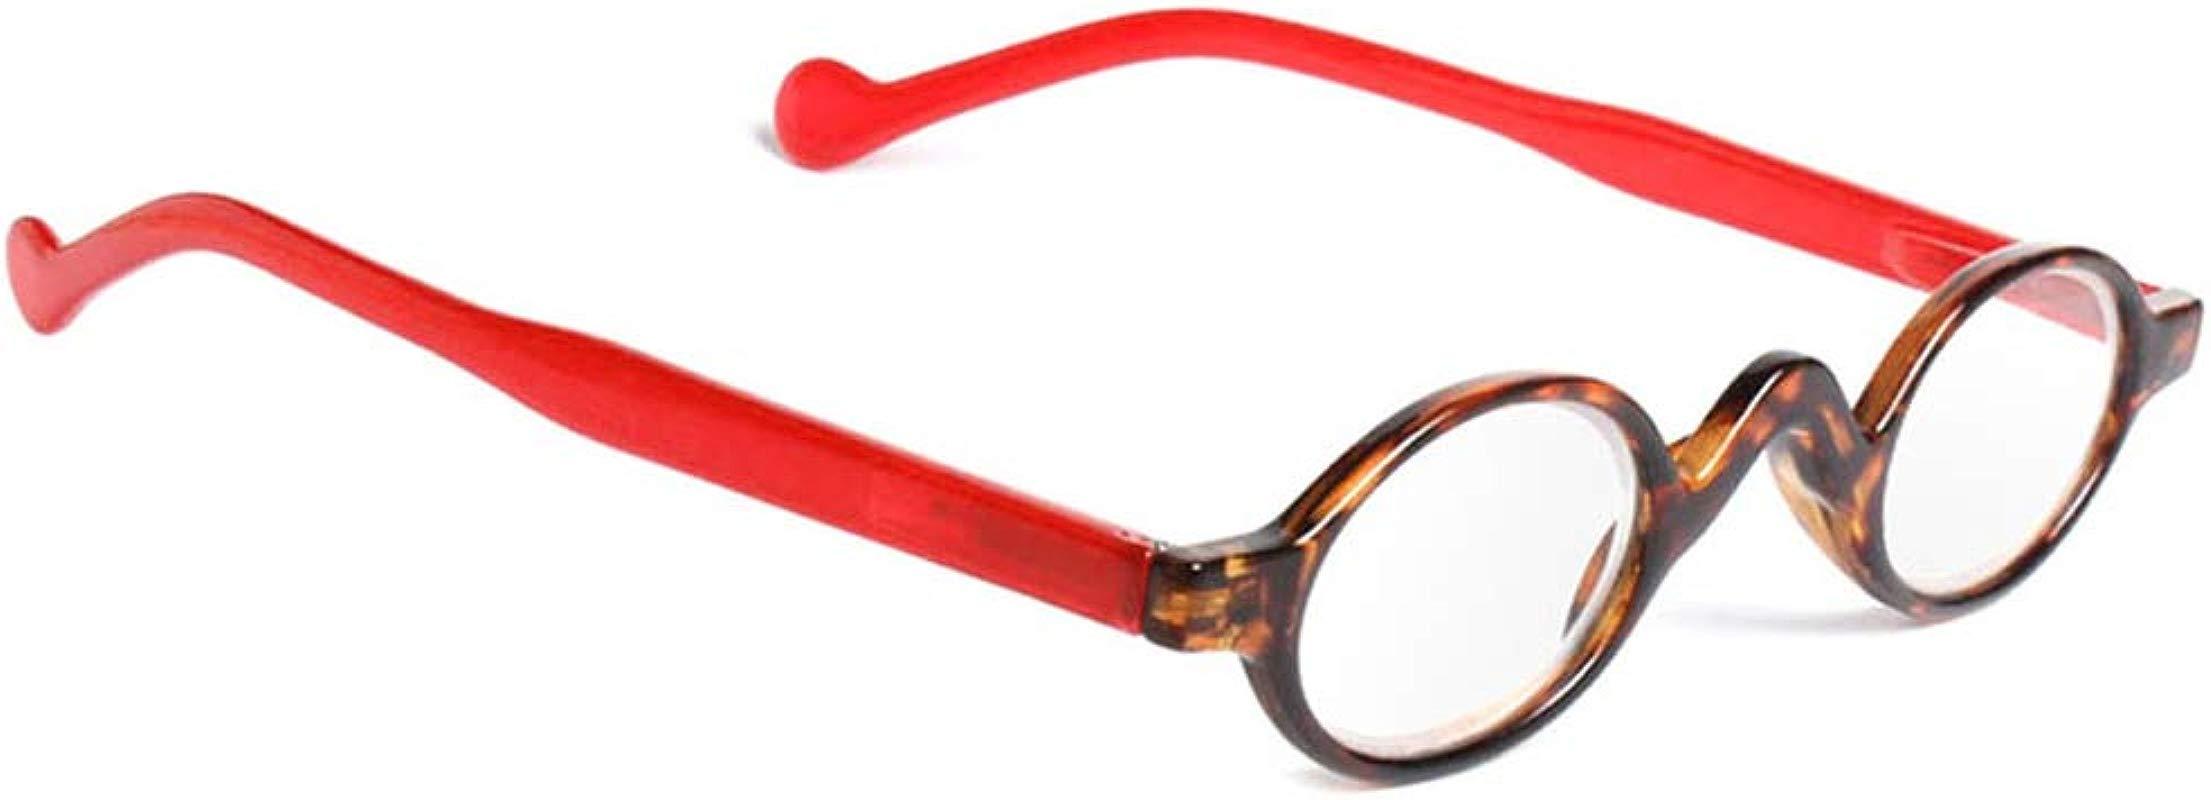 Retro Vintage Mini Small Round Frame Men Womens Readers Reading Glasses